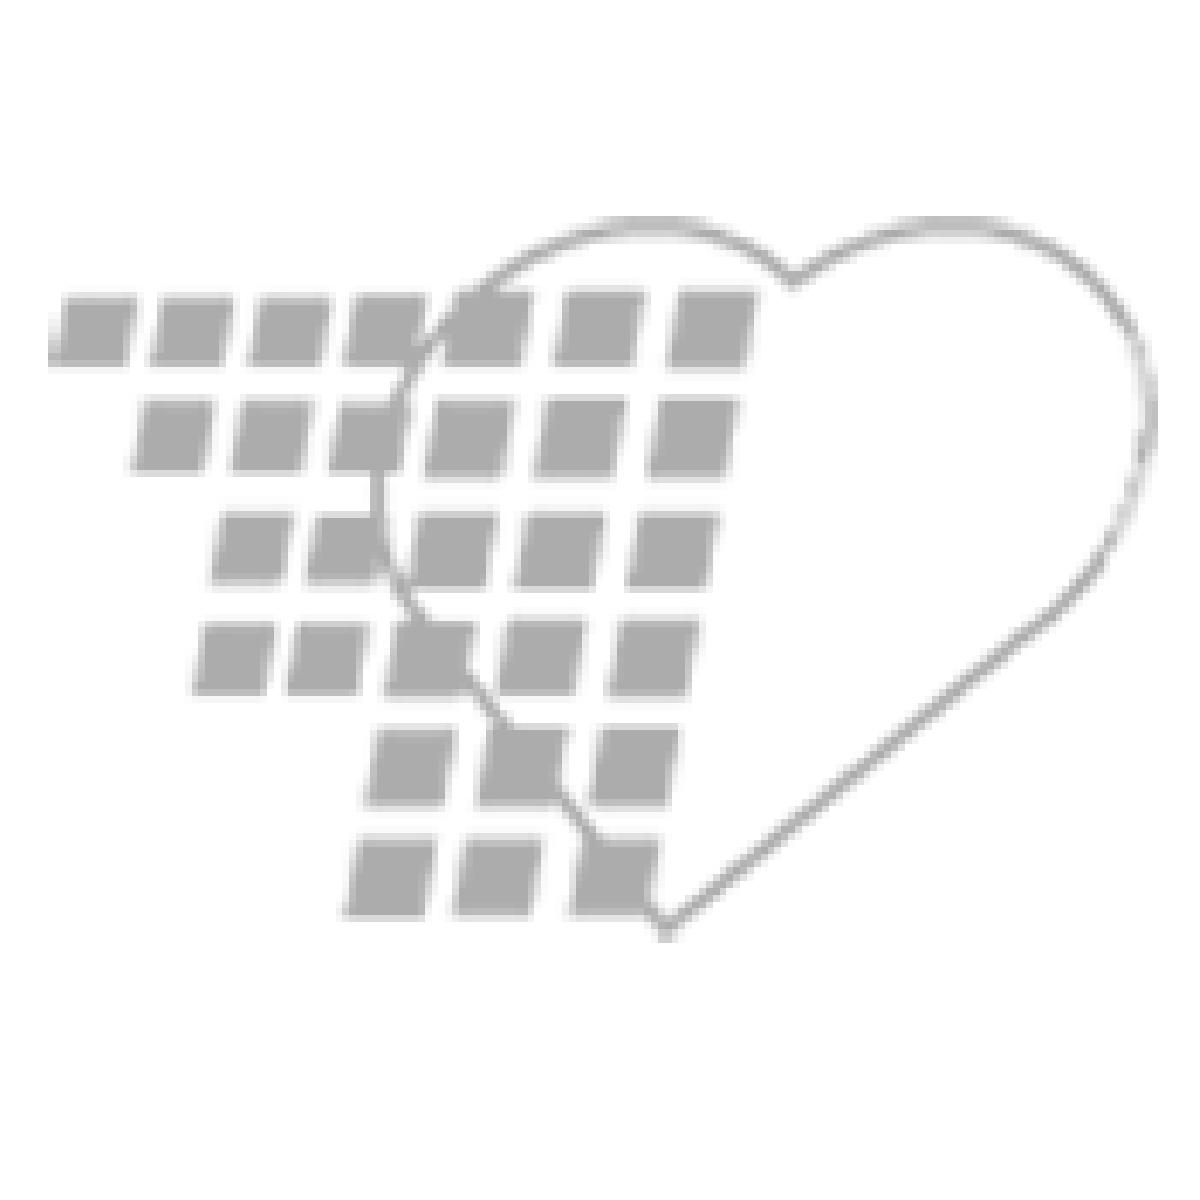 06-93-1030-500ML - Demo Dose® Lactatd Ringr  's IV Fluid 500mL